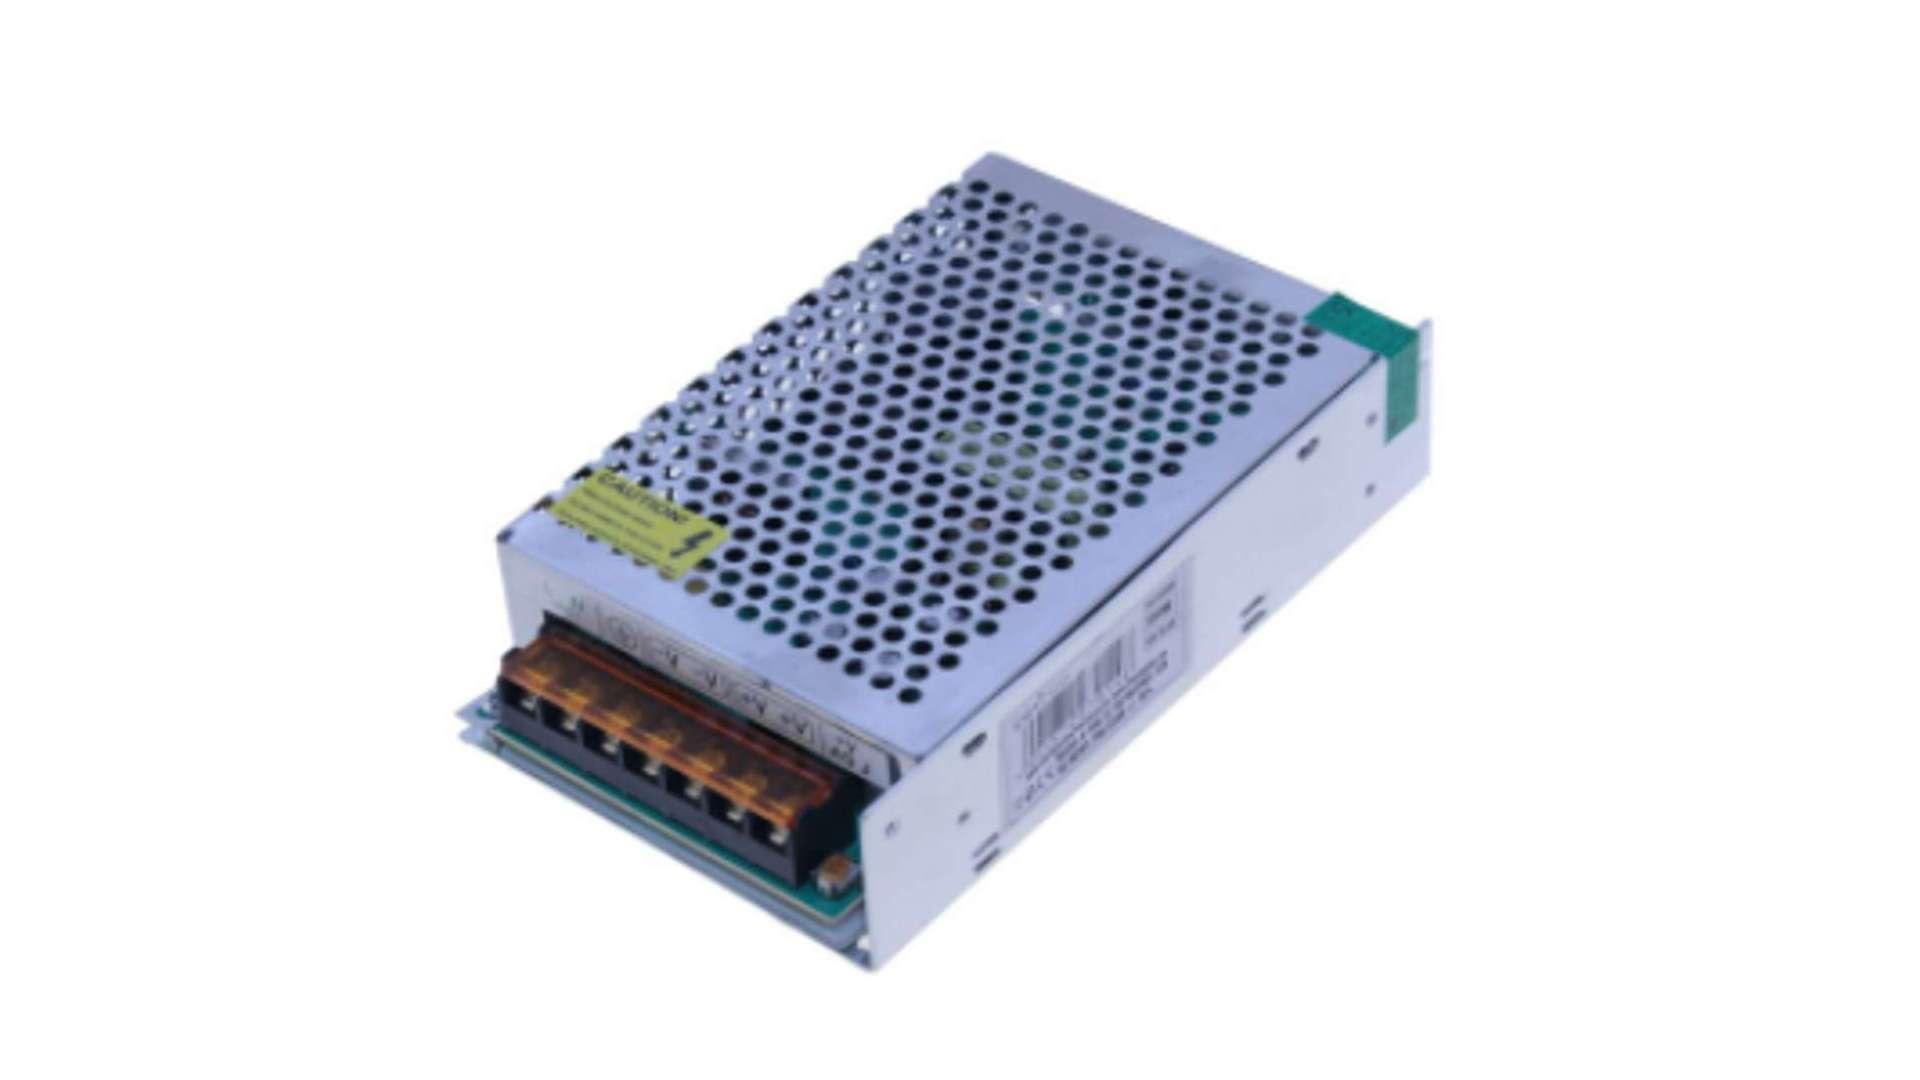 12V 100W IP20 enclosed power supply